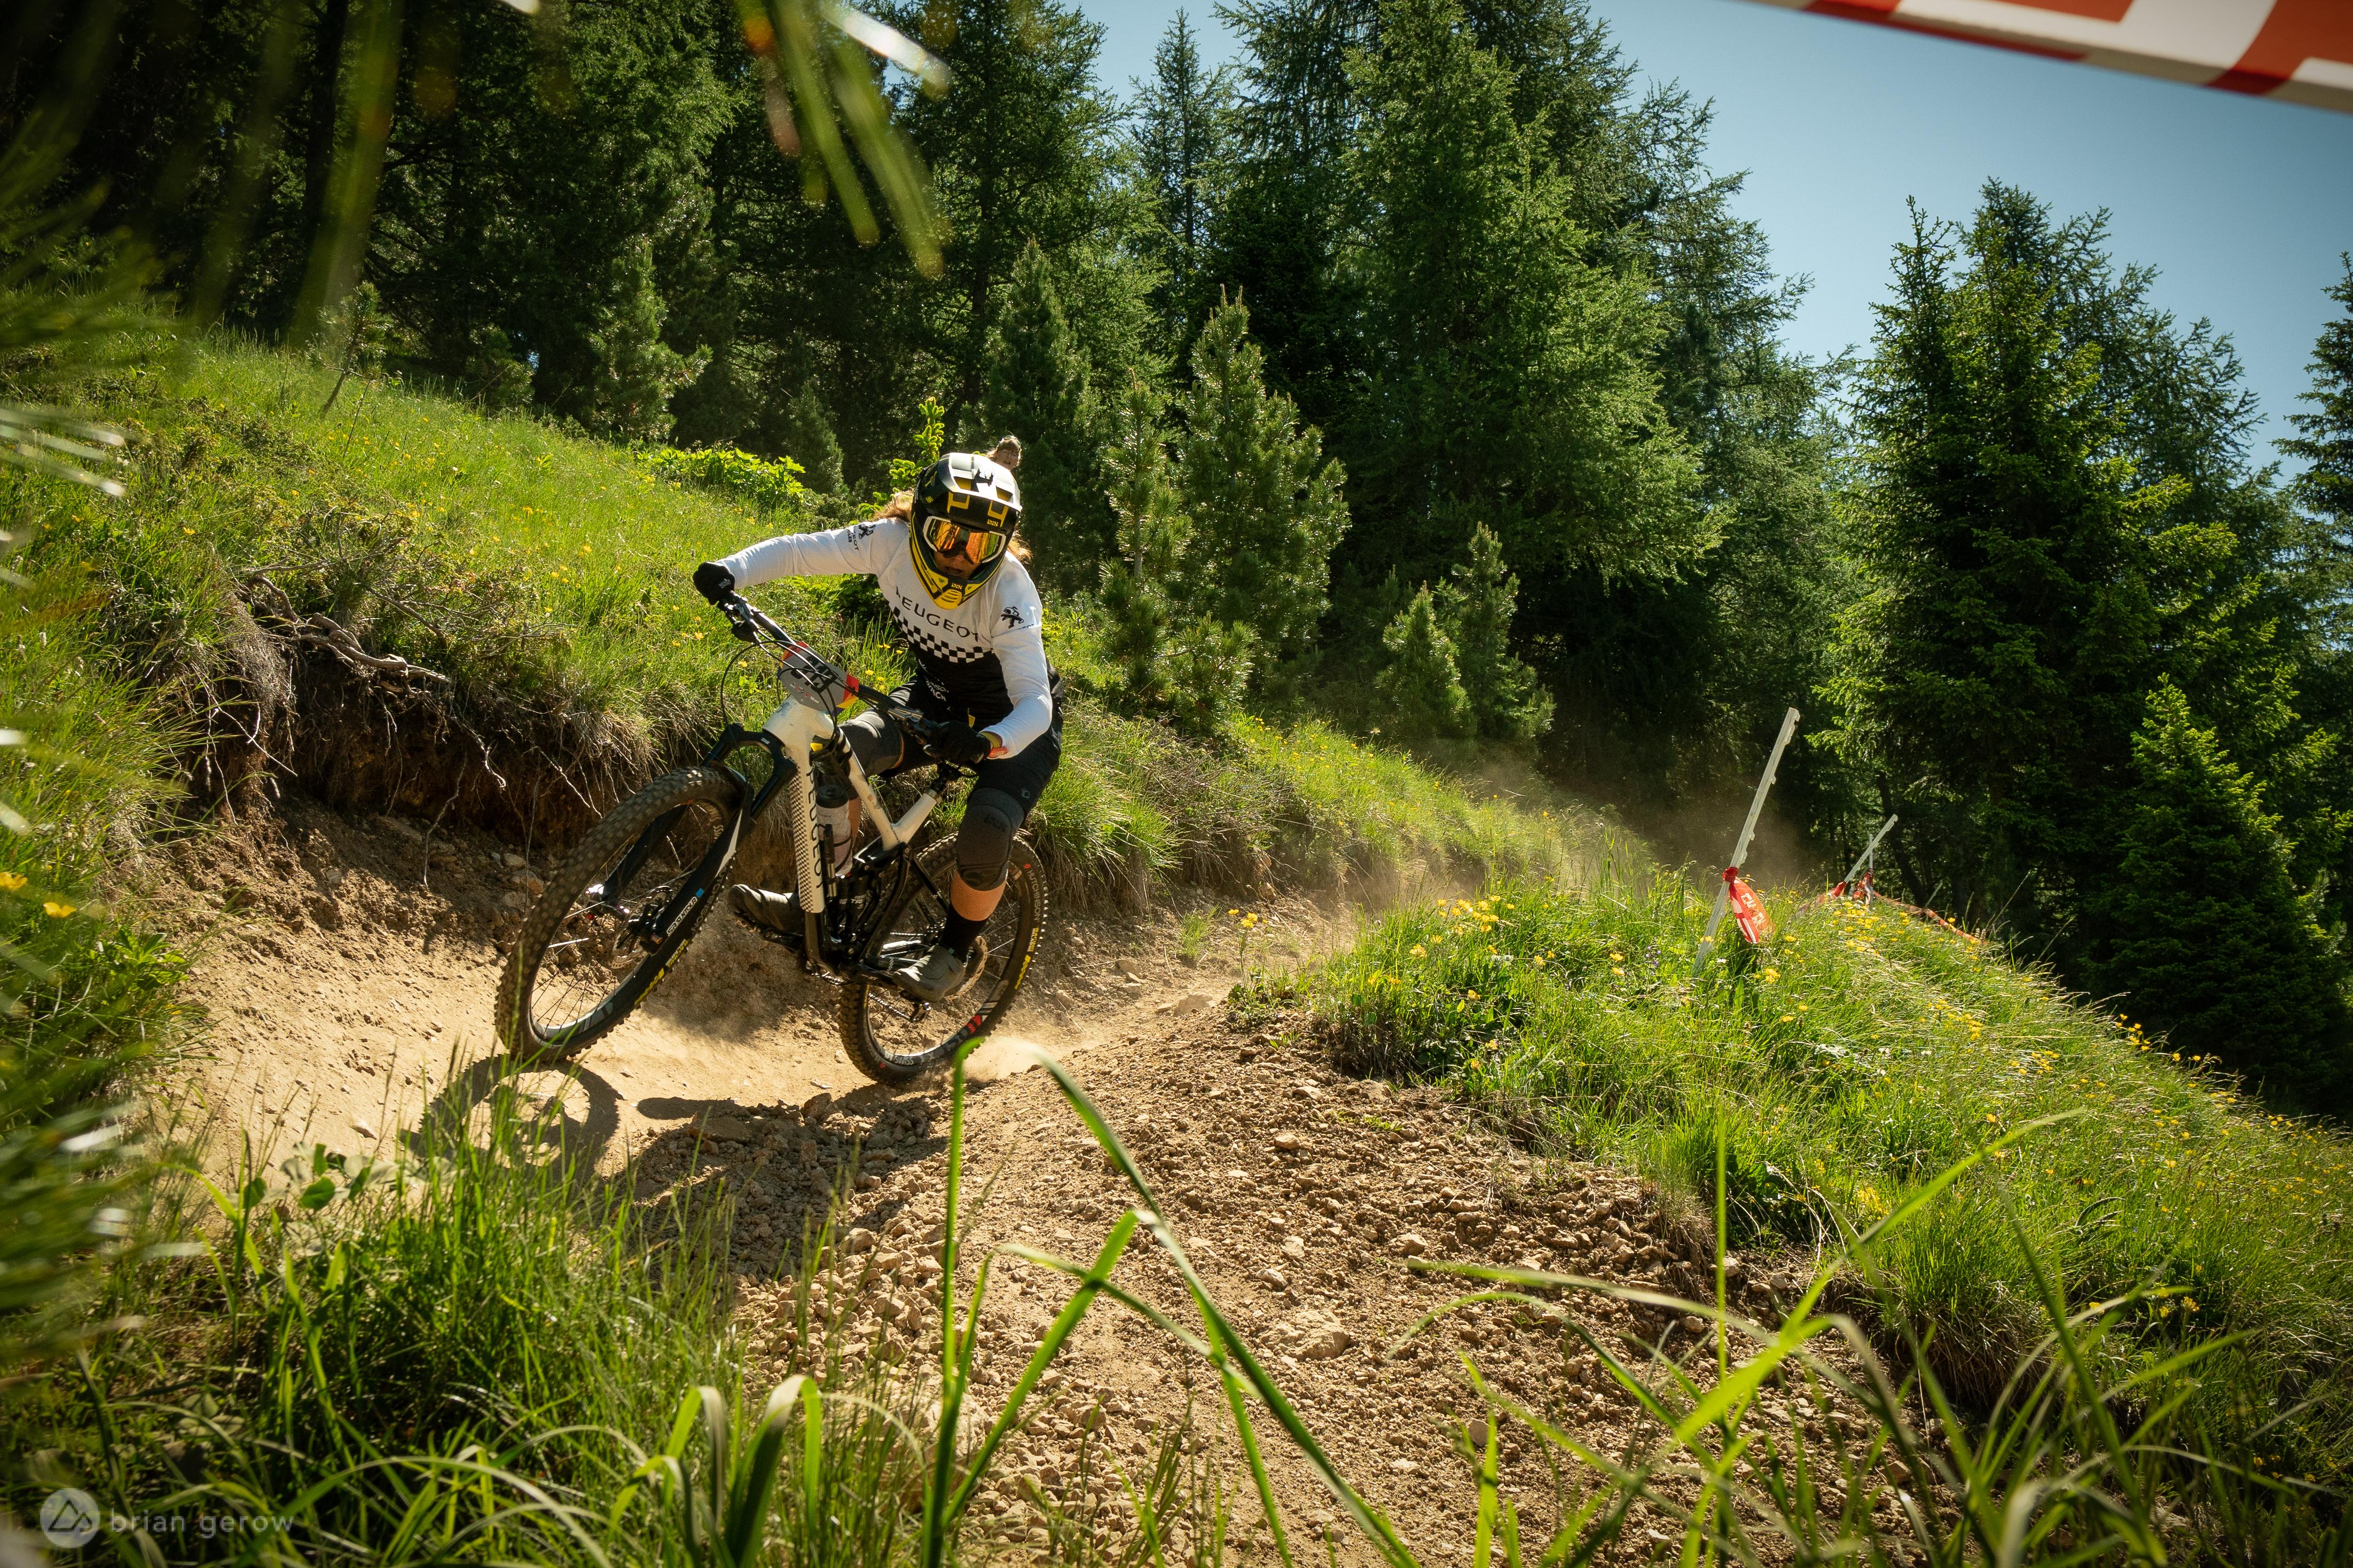 The Winningest Enduro Bikes and Riders Over the Past 4 EWS Seasons - Singletracks Mountain Bike News